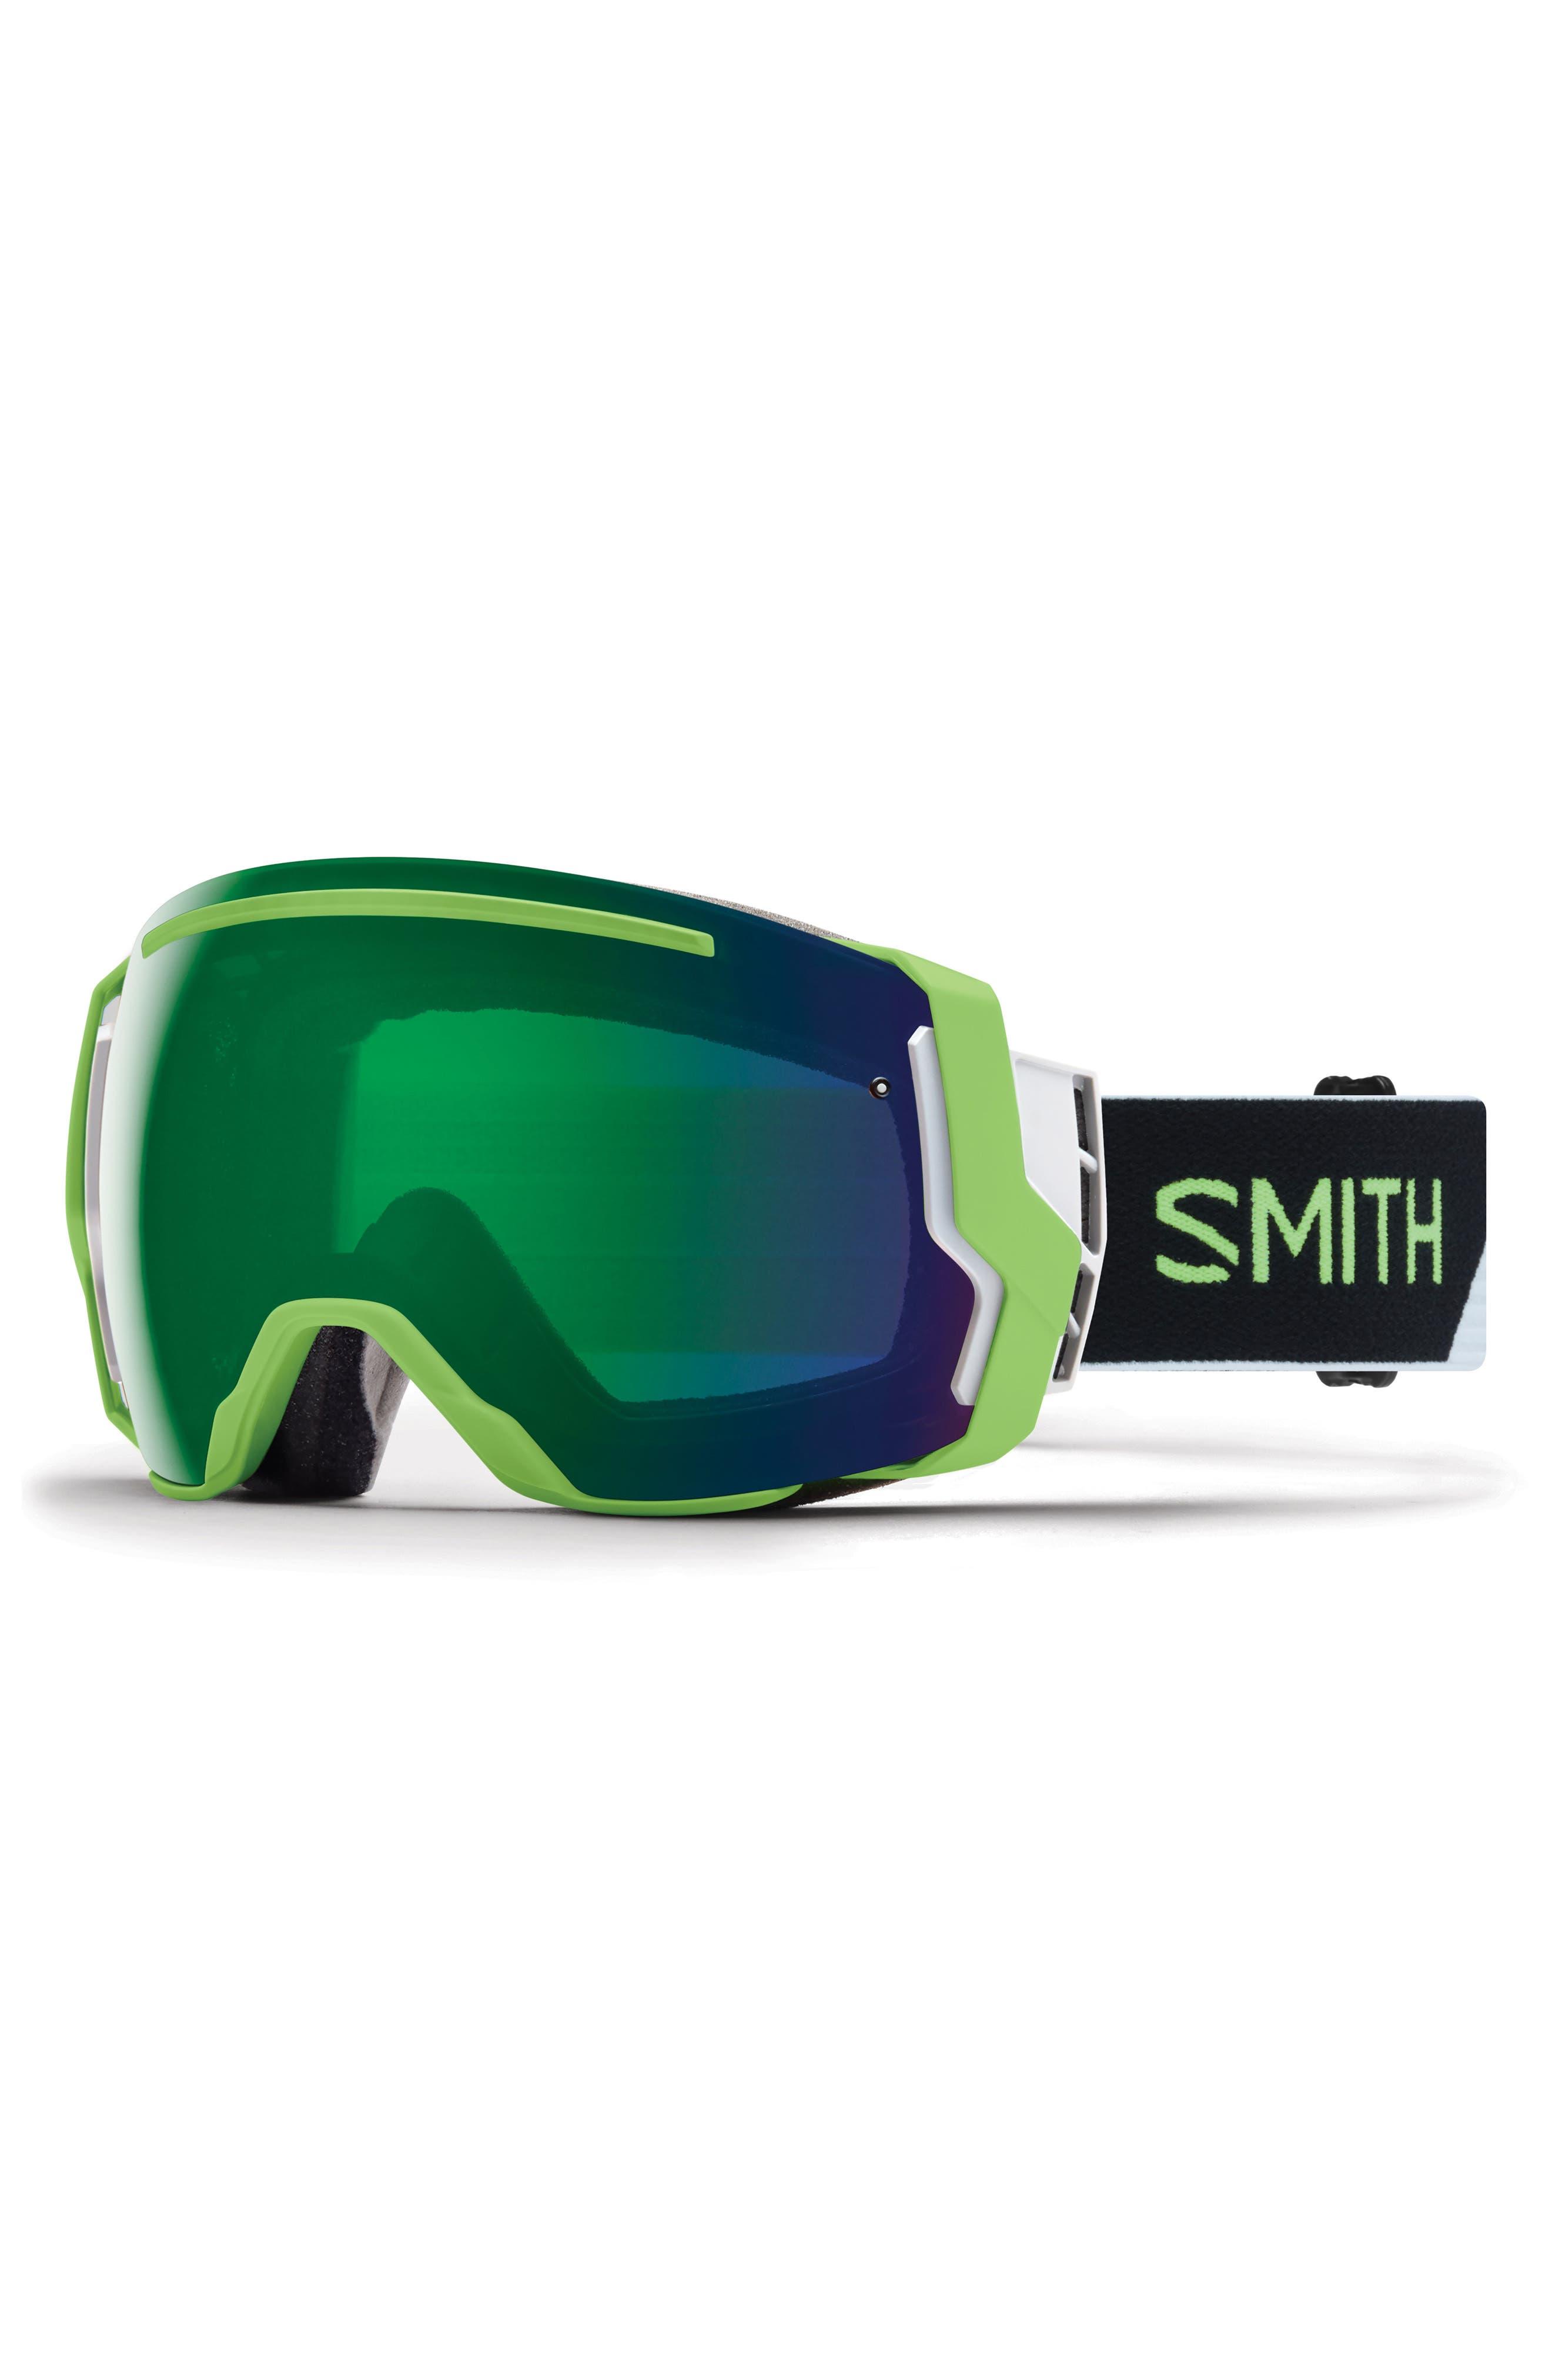 Smith I/O7 Chromapop 185mm Snow Goggles